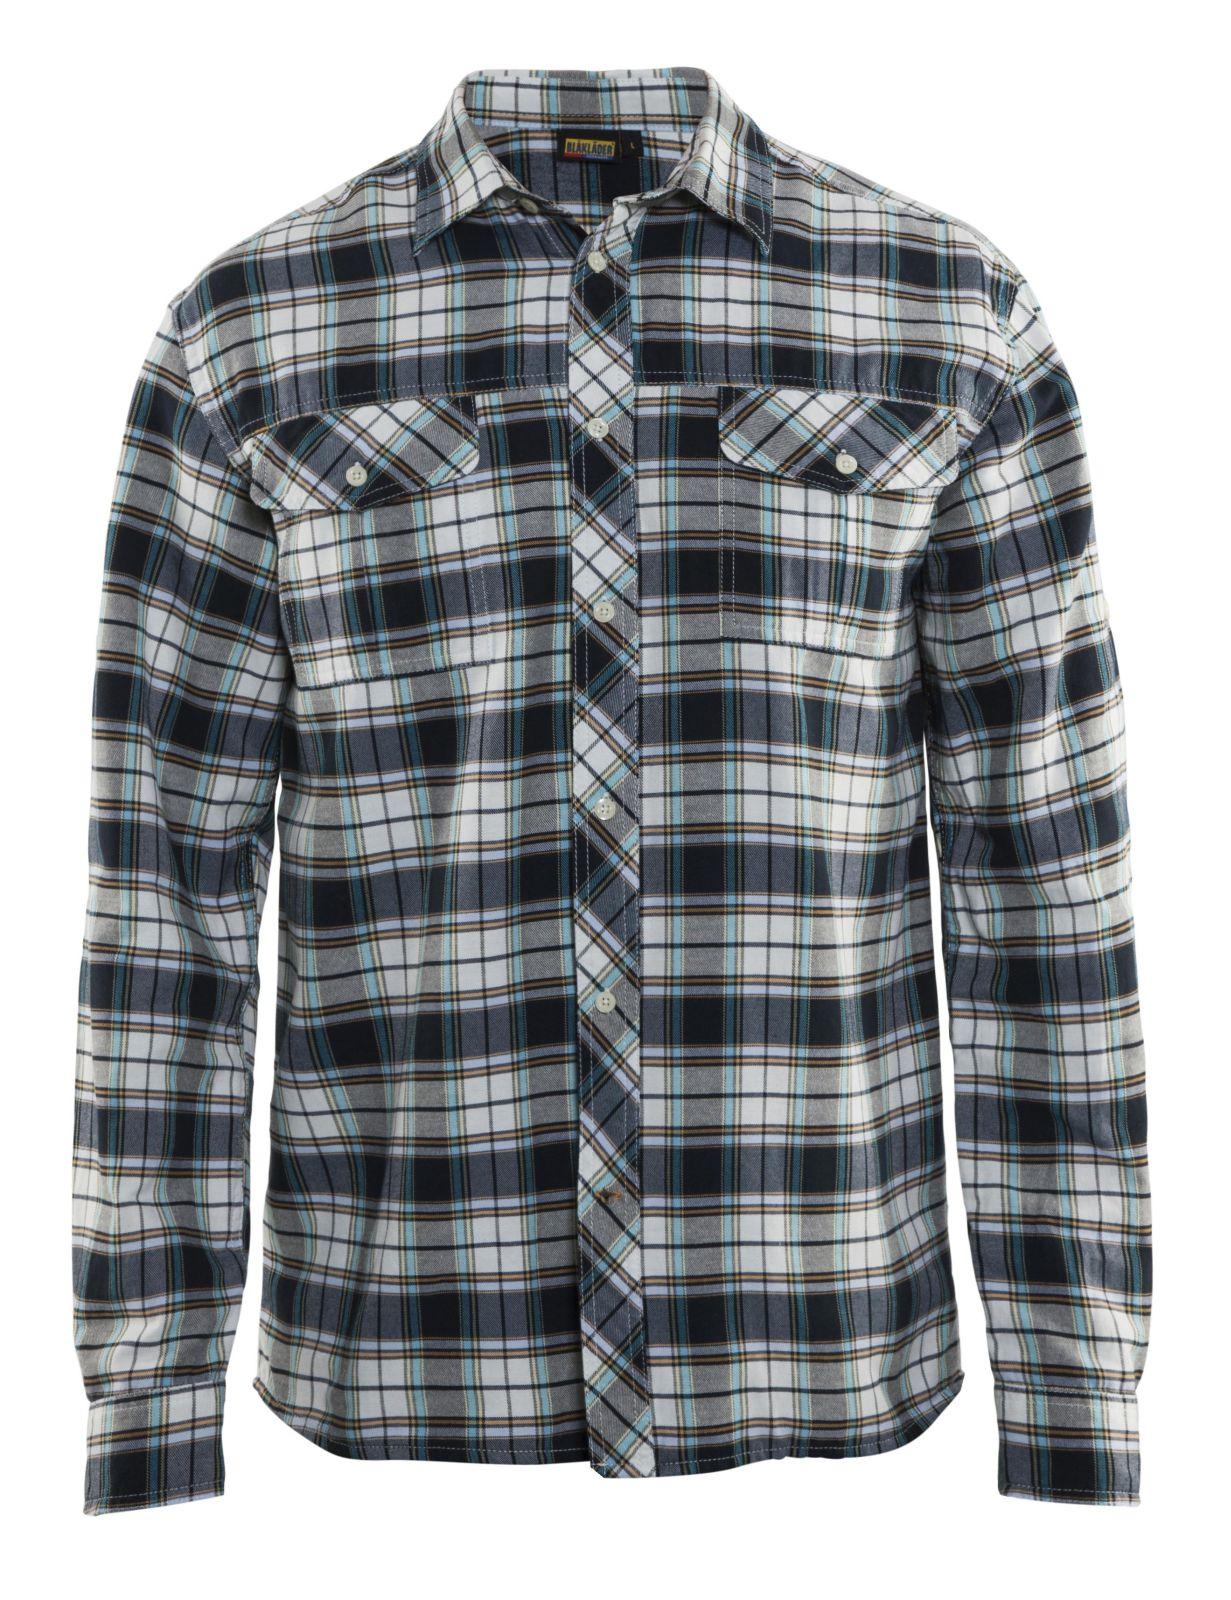 Blaklader Overhemden 32991136 zwart-offwhite(9920)